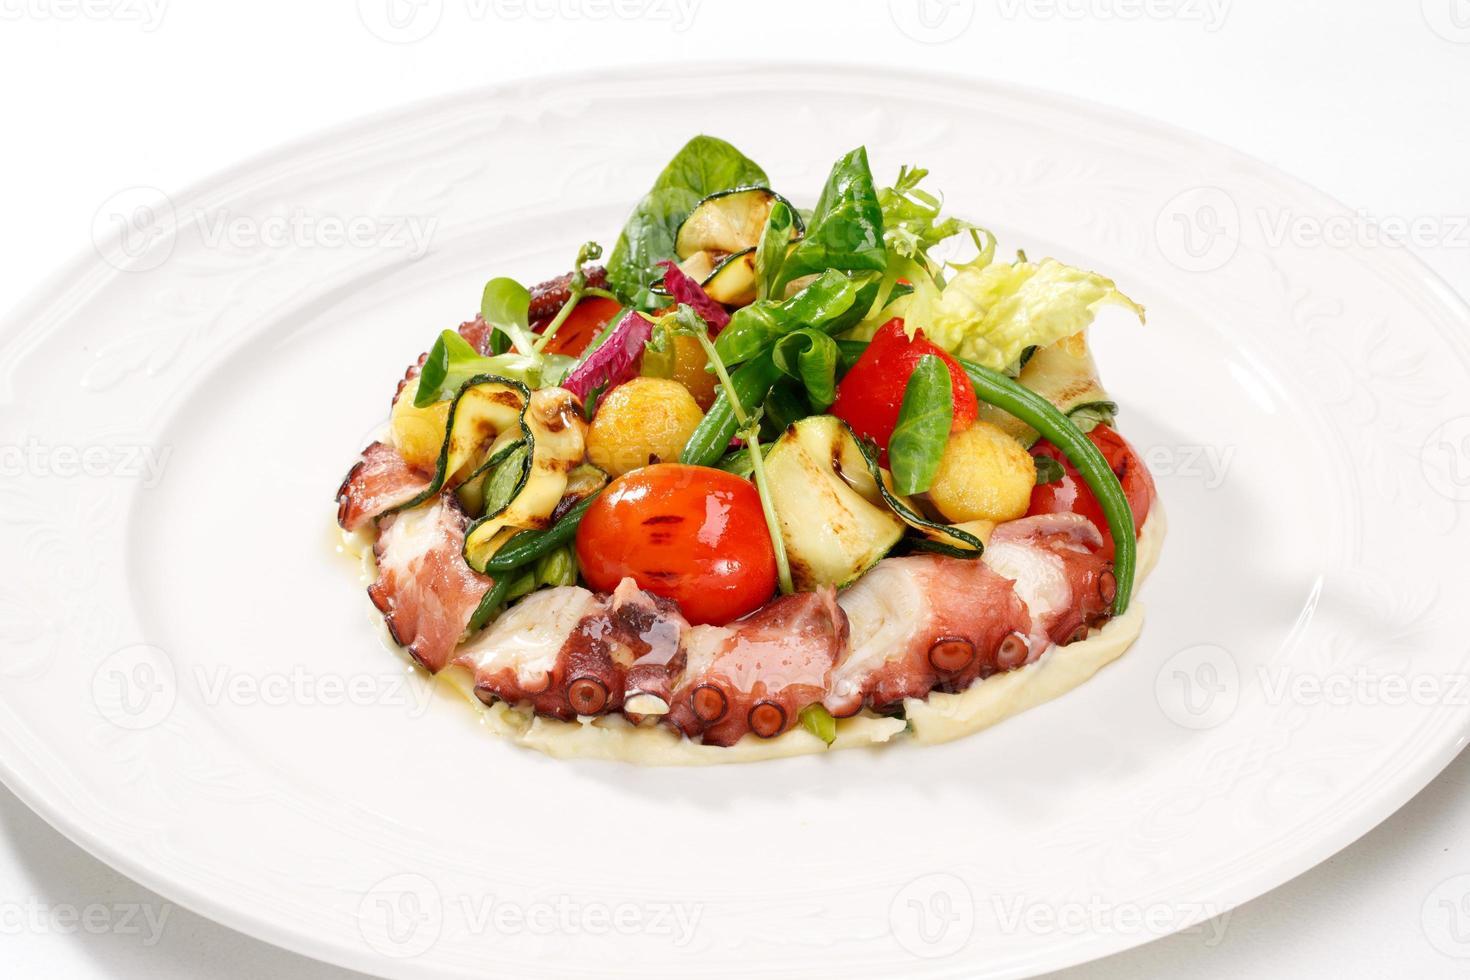 insalate e piatti di pesce fresco foto